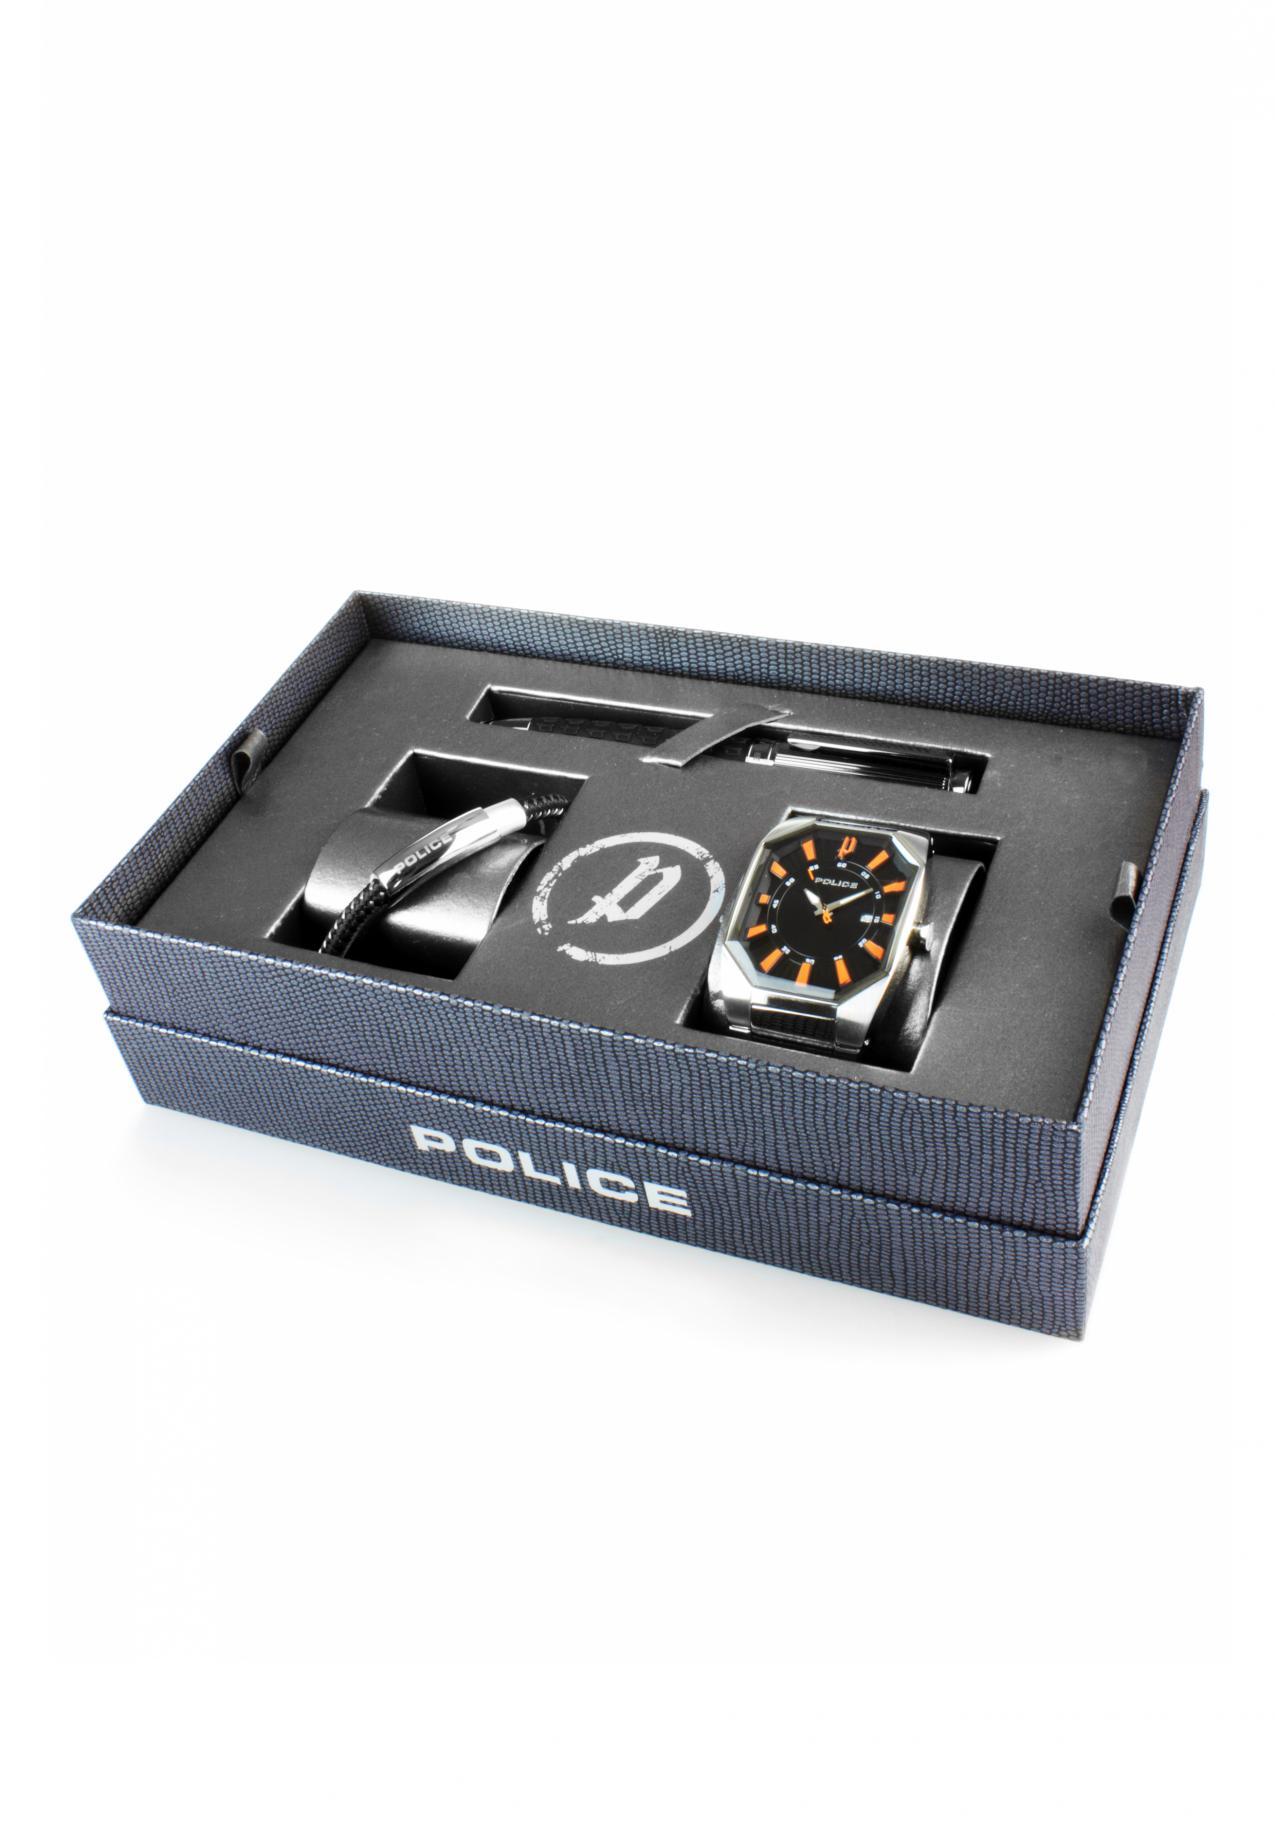 Police Octane Geschenkbox (Uhr, Armband, Kugelschreiber)